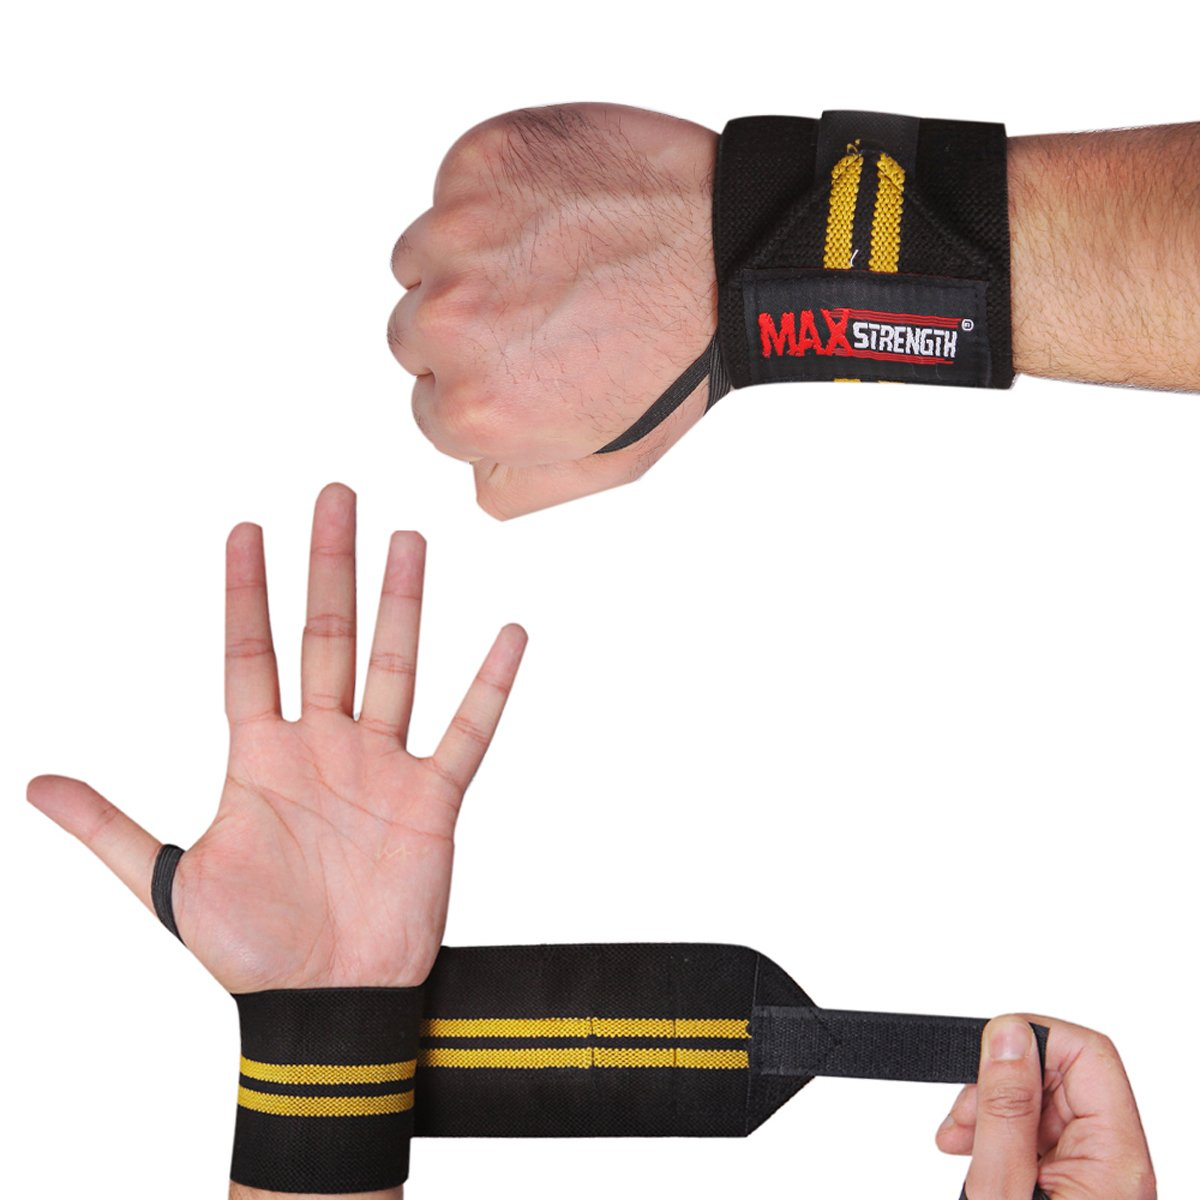 Yellow//Black donna Uomo Bodybuilding Gym Training lunghezza: 30,5/cm Maxstrenght/® Coppia fasce polsiera /Supporto polso per sollevamento pesi in palestra e powerlifting